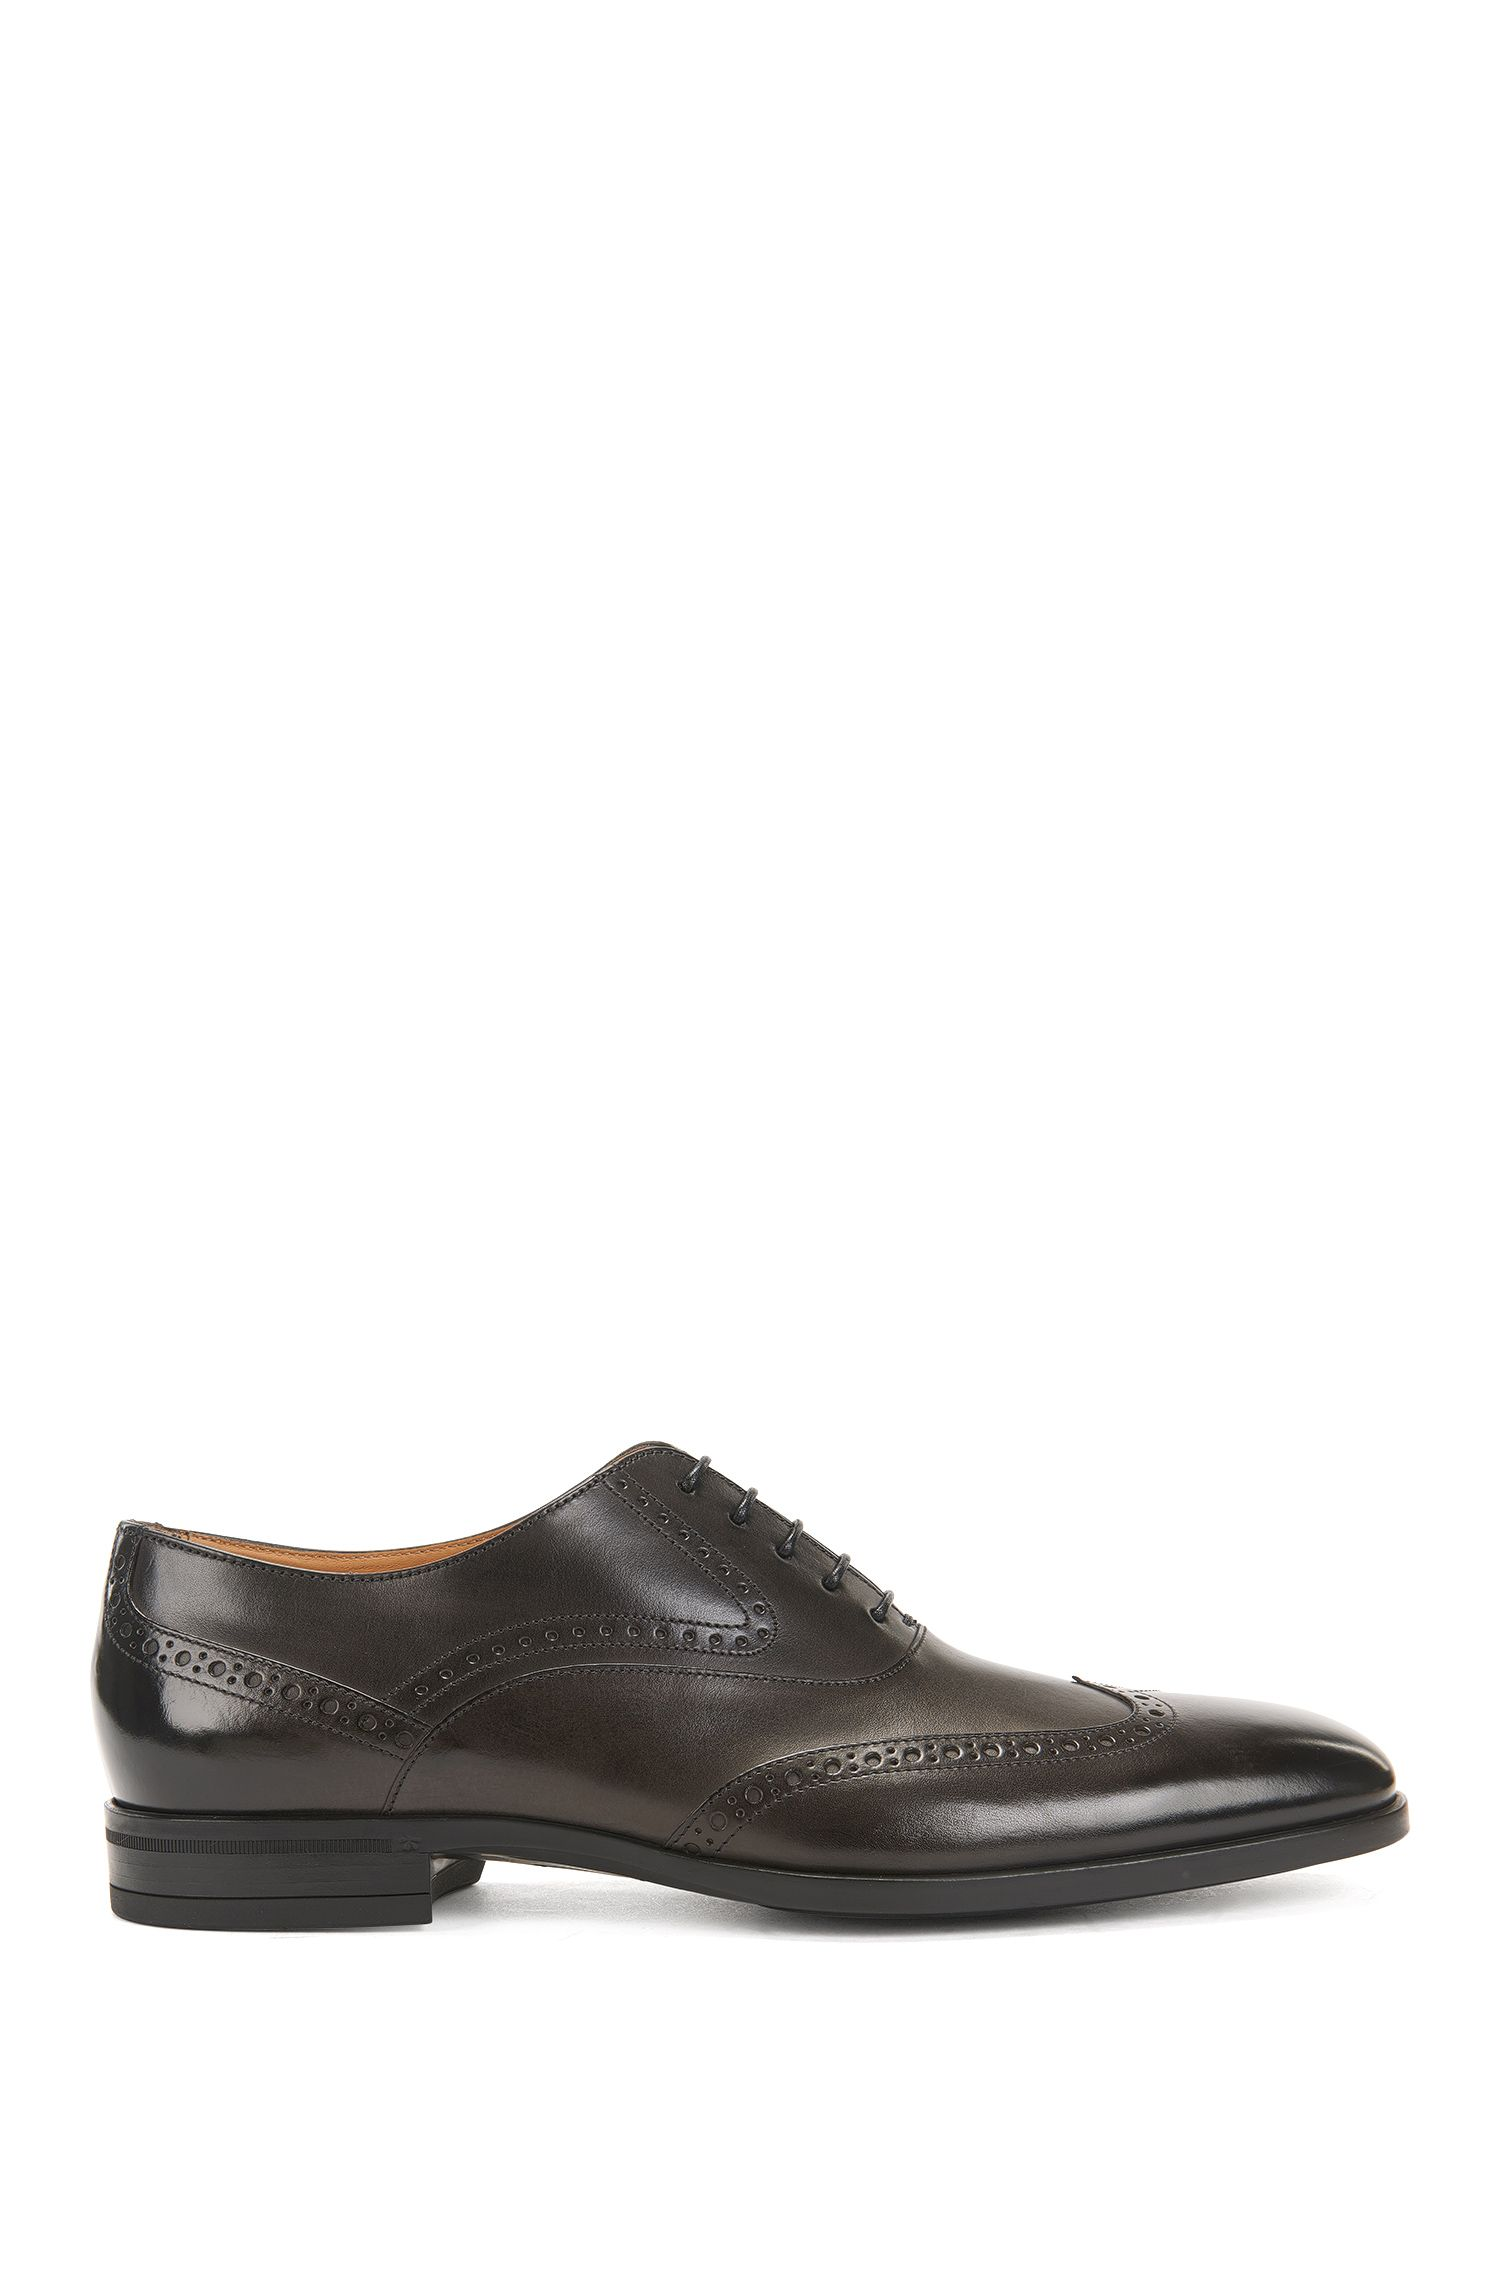 Leather Wingtip Shoe | Kensington Oxfr